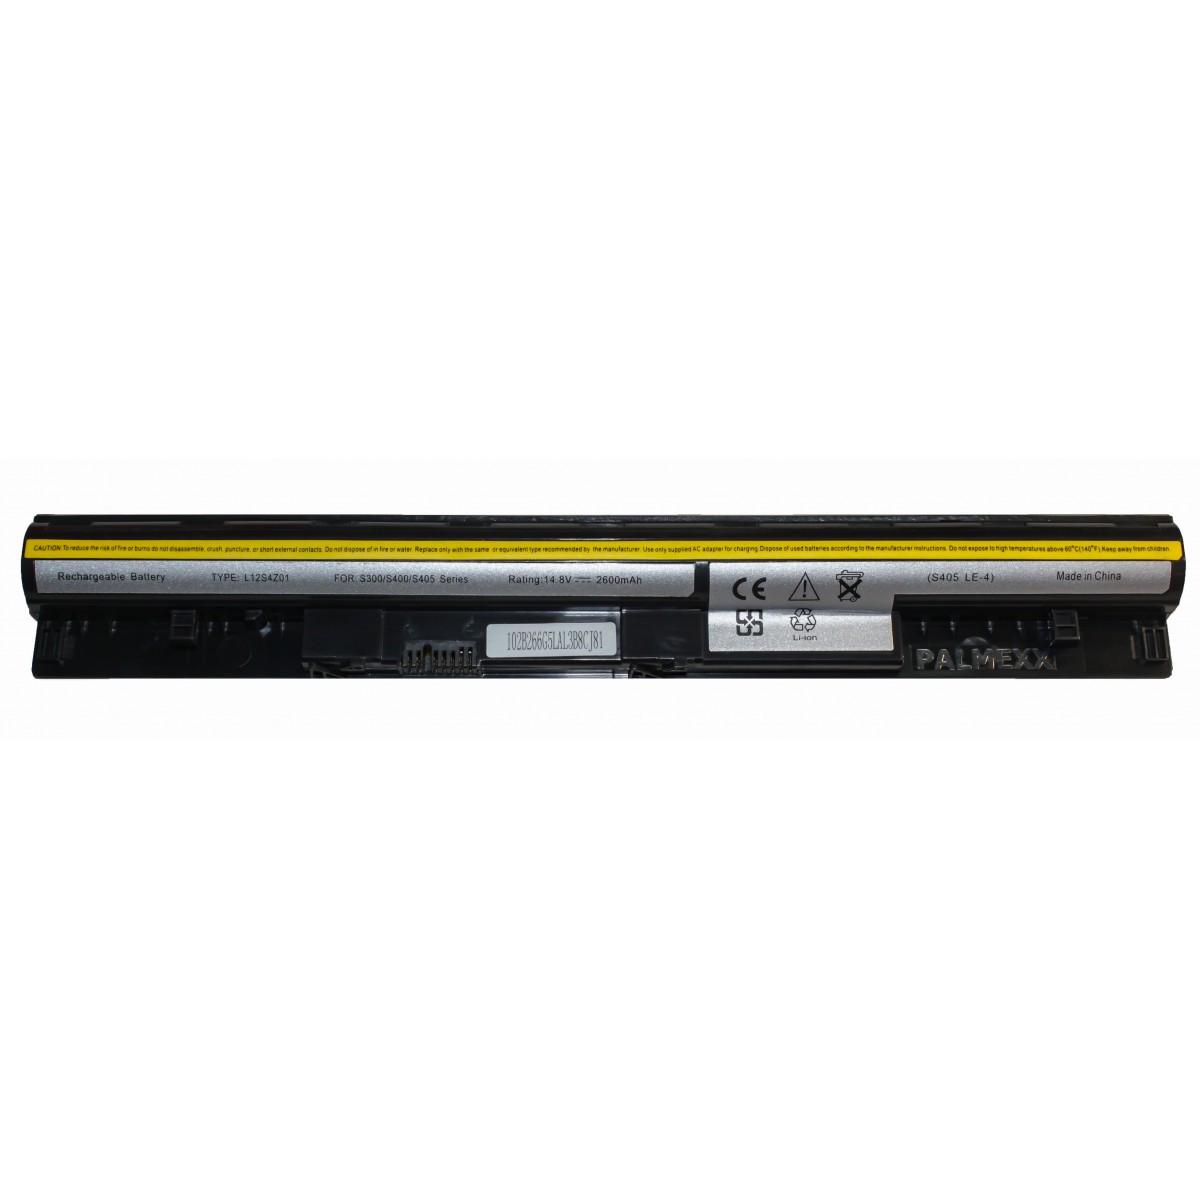 Батарея для ноутбука Lenovo IdeaPad S400, L12S4Z01 (14.8 v, 2200 mAh) Original